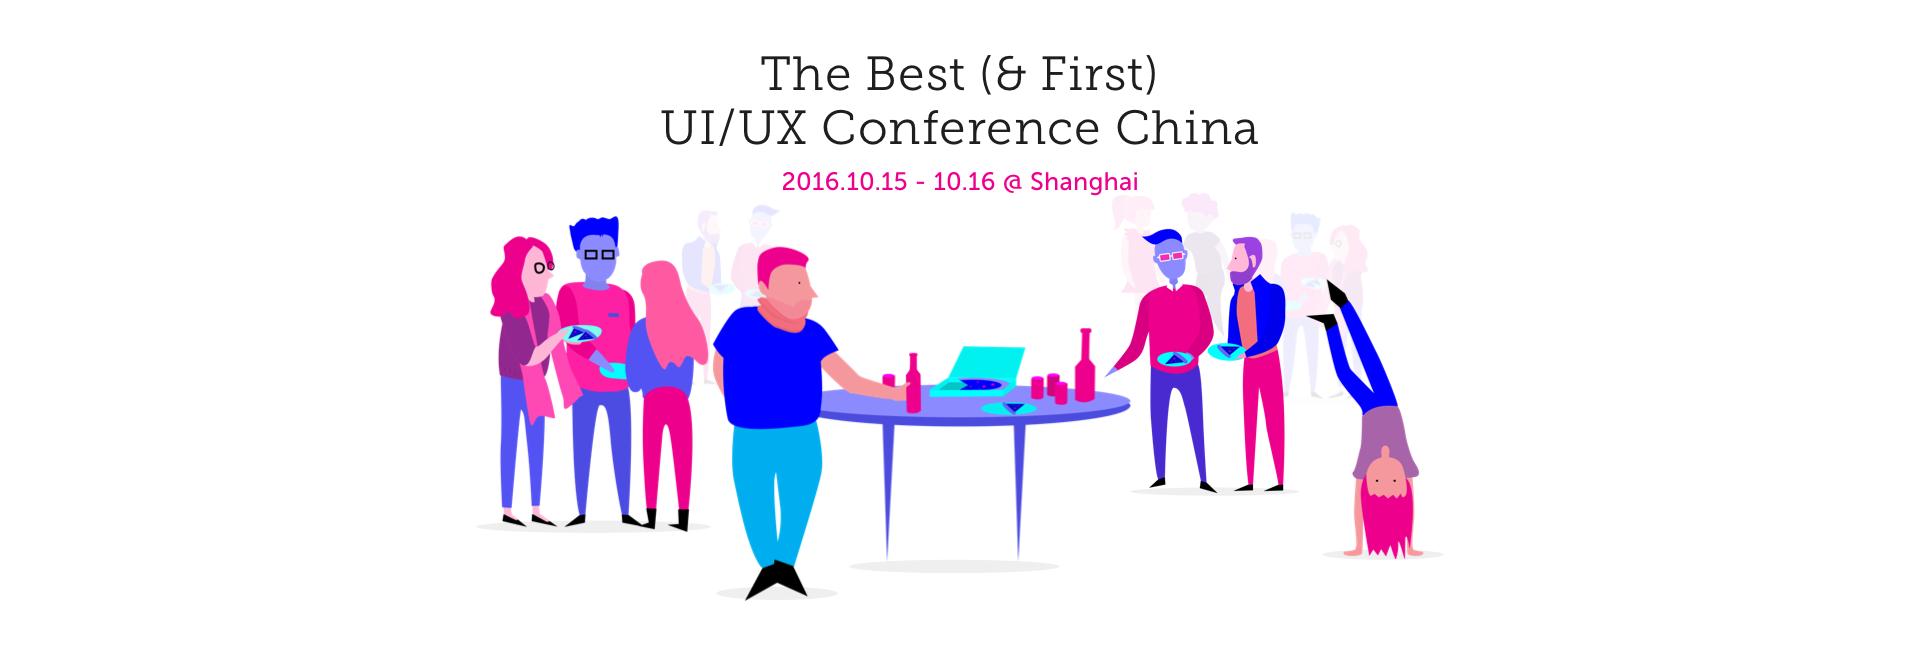 UI/UX Conf China 2016 中国交互与界面设计大会